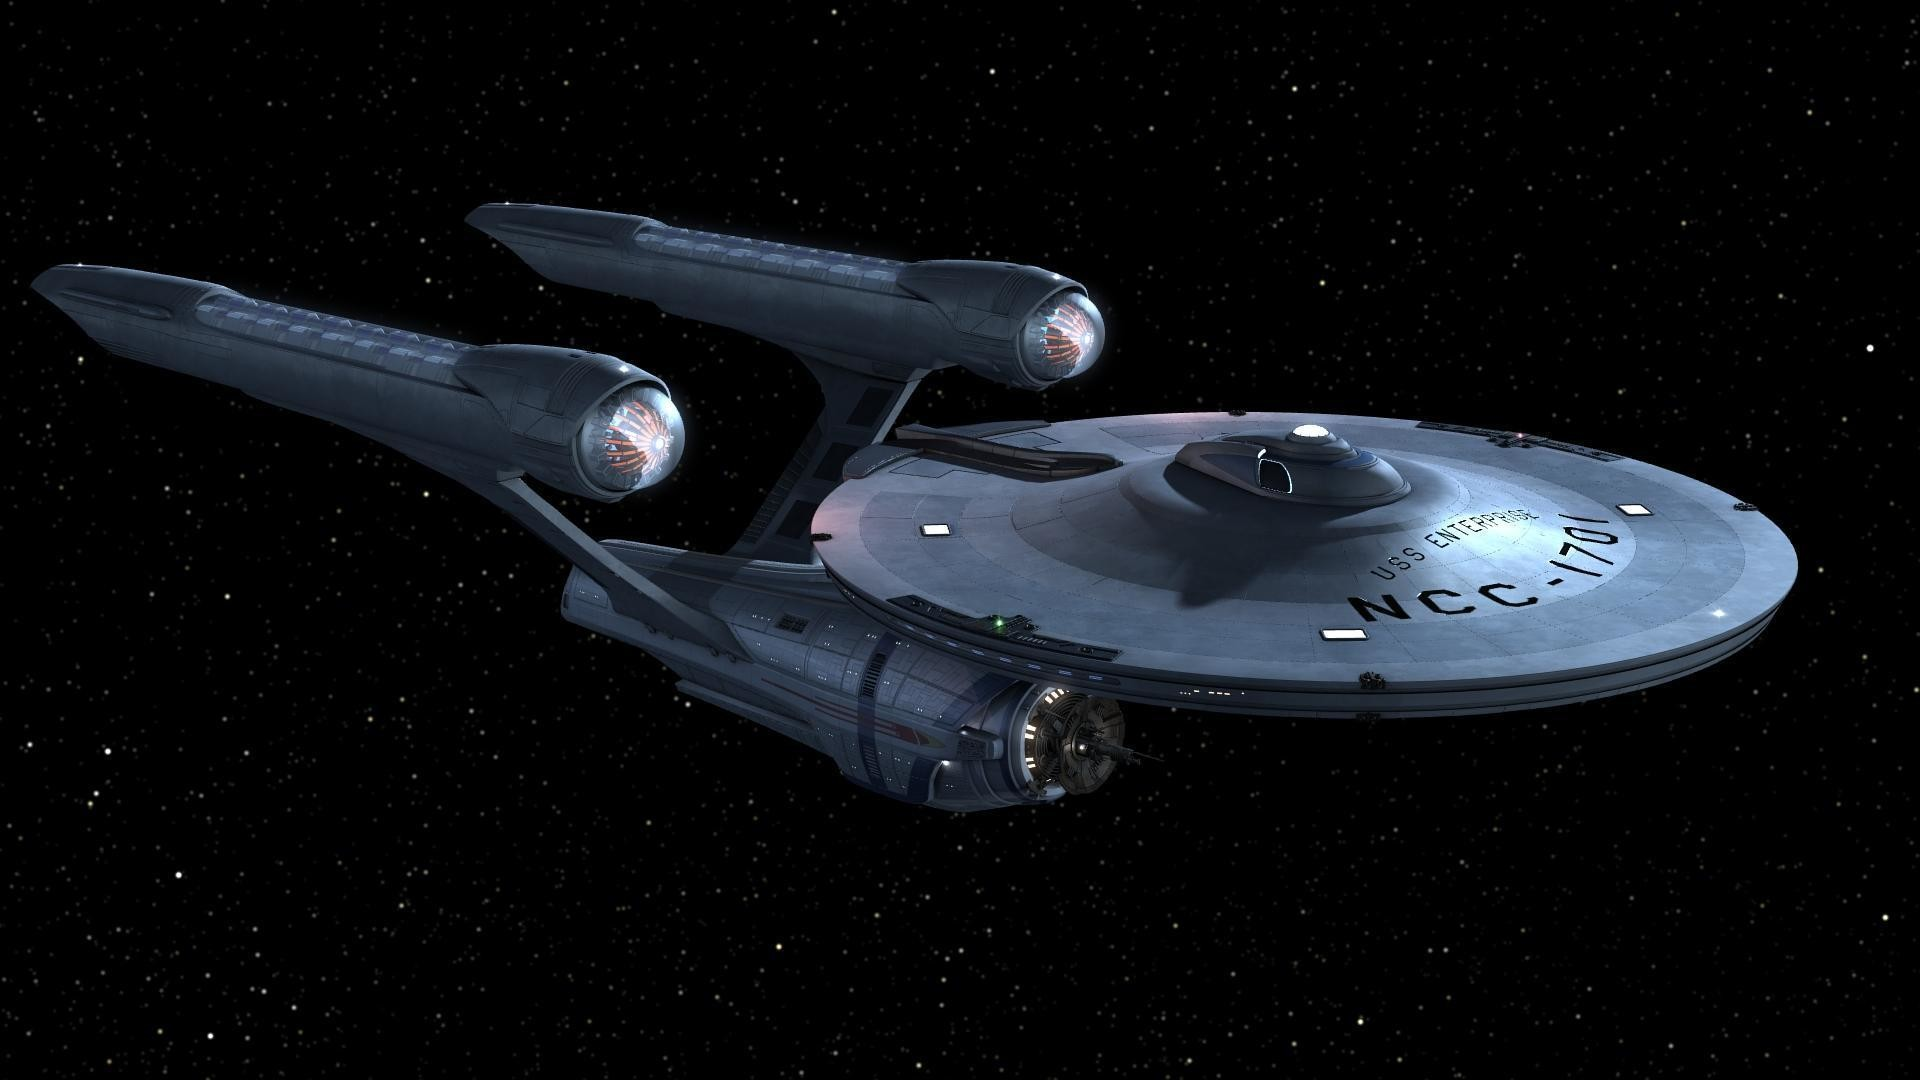 Star Trek wallpapers in high resolution – HD Wallpaper